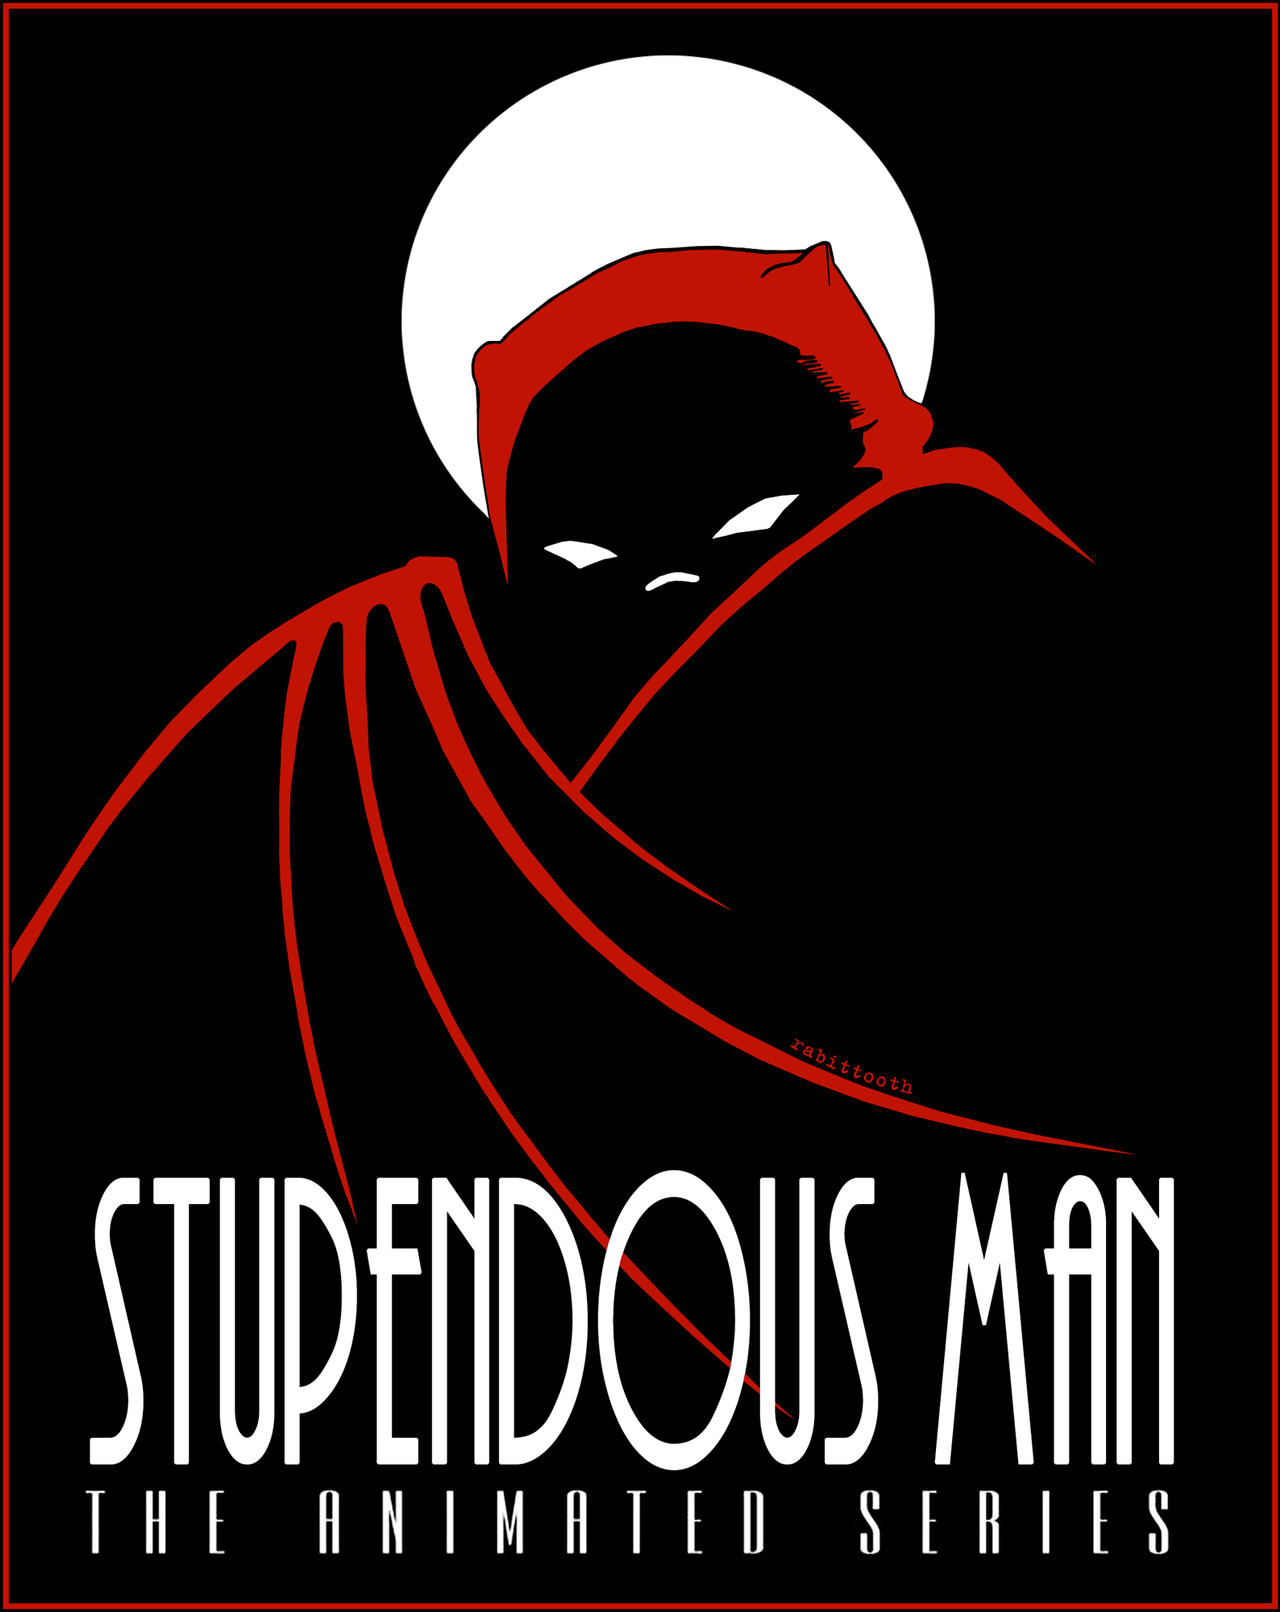 Stupendous Man Animated Series